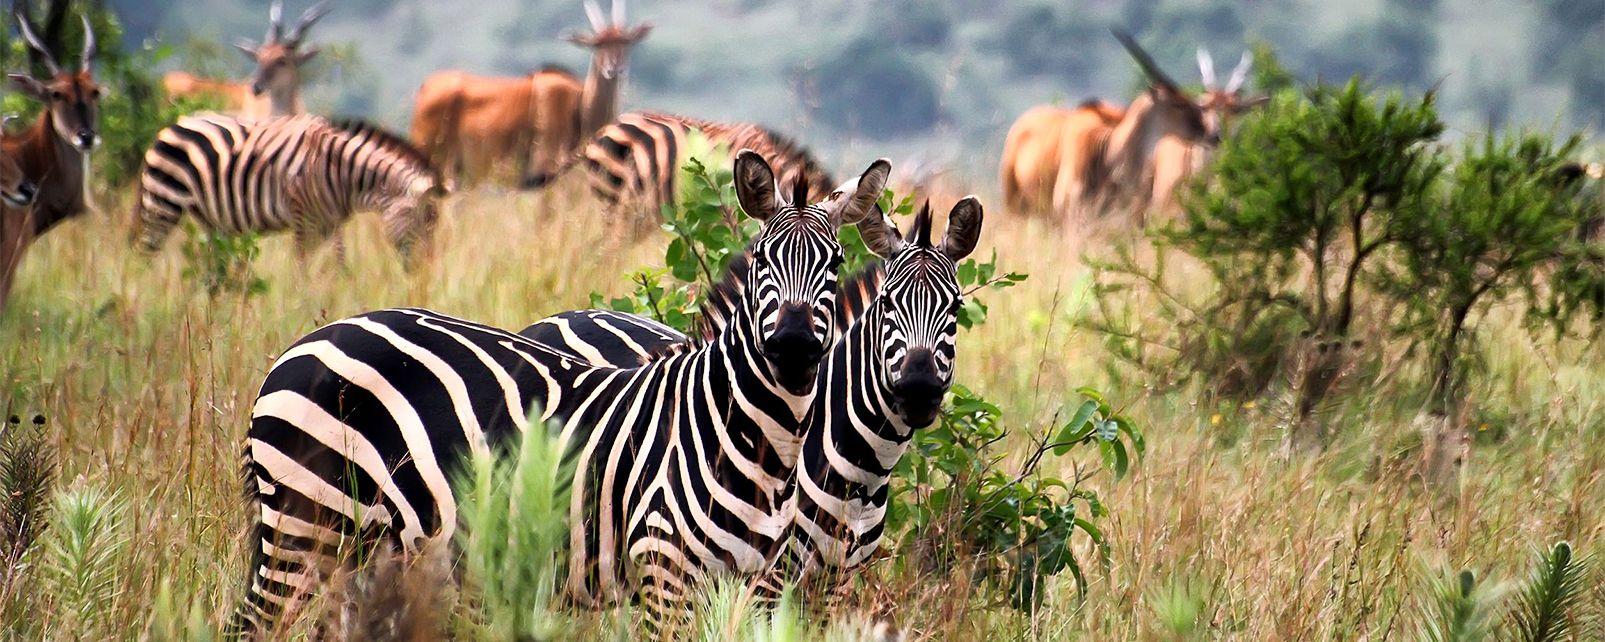 Le Parc national de l'Akagera , Rwanda